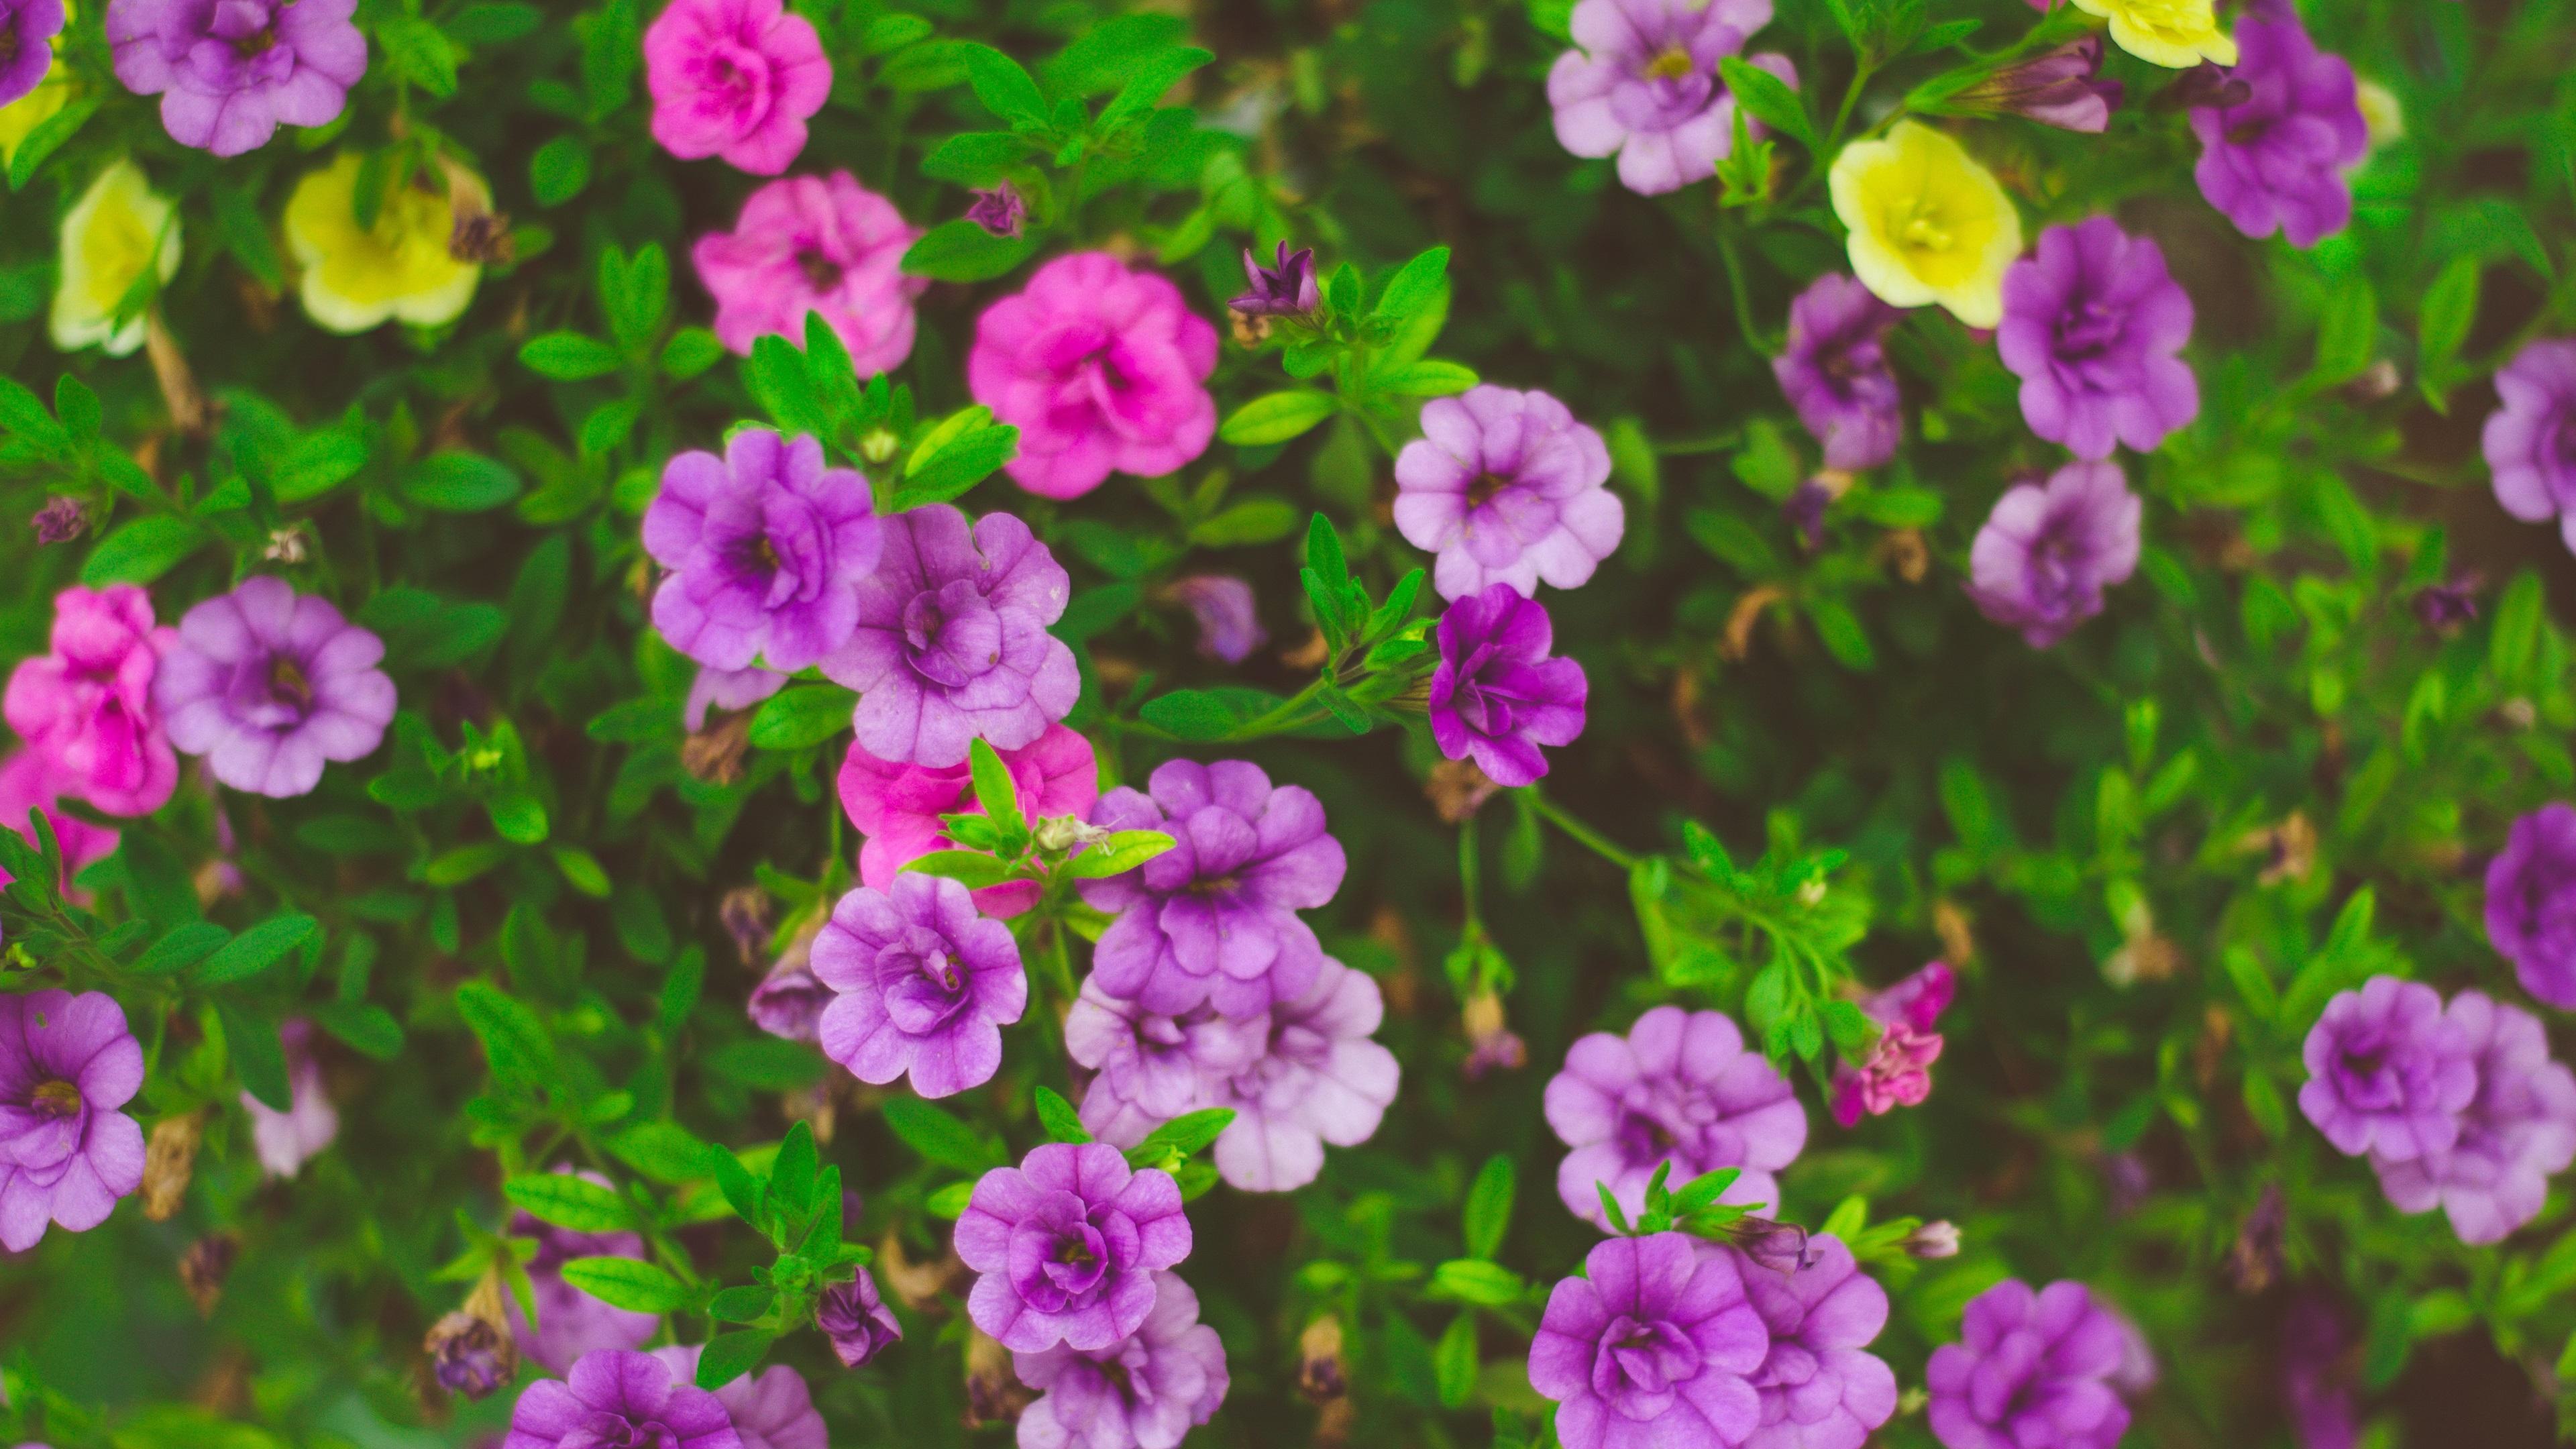 Wallpaper Beautiful Flowers Pink Purple Yellow 3840x2160 Uhd 4k